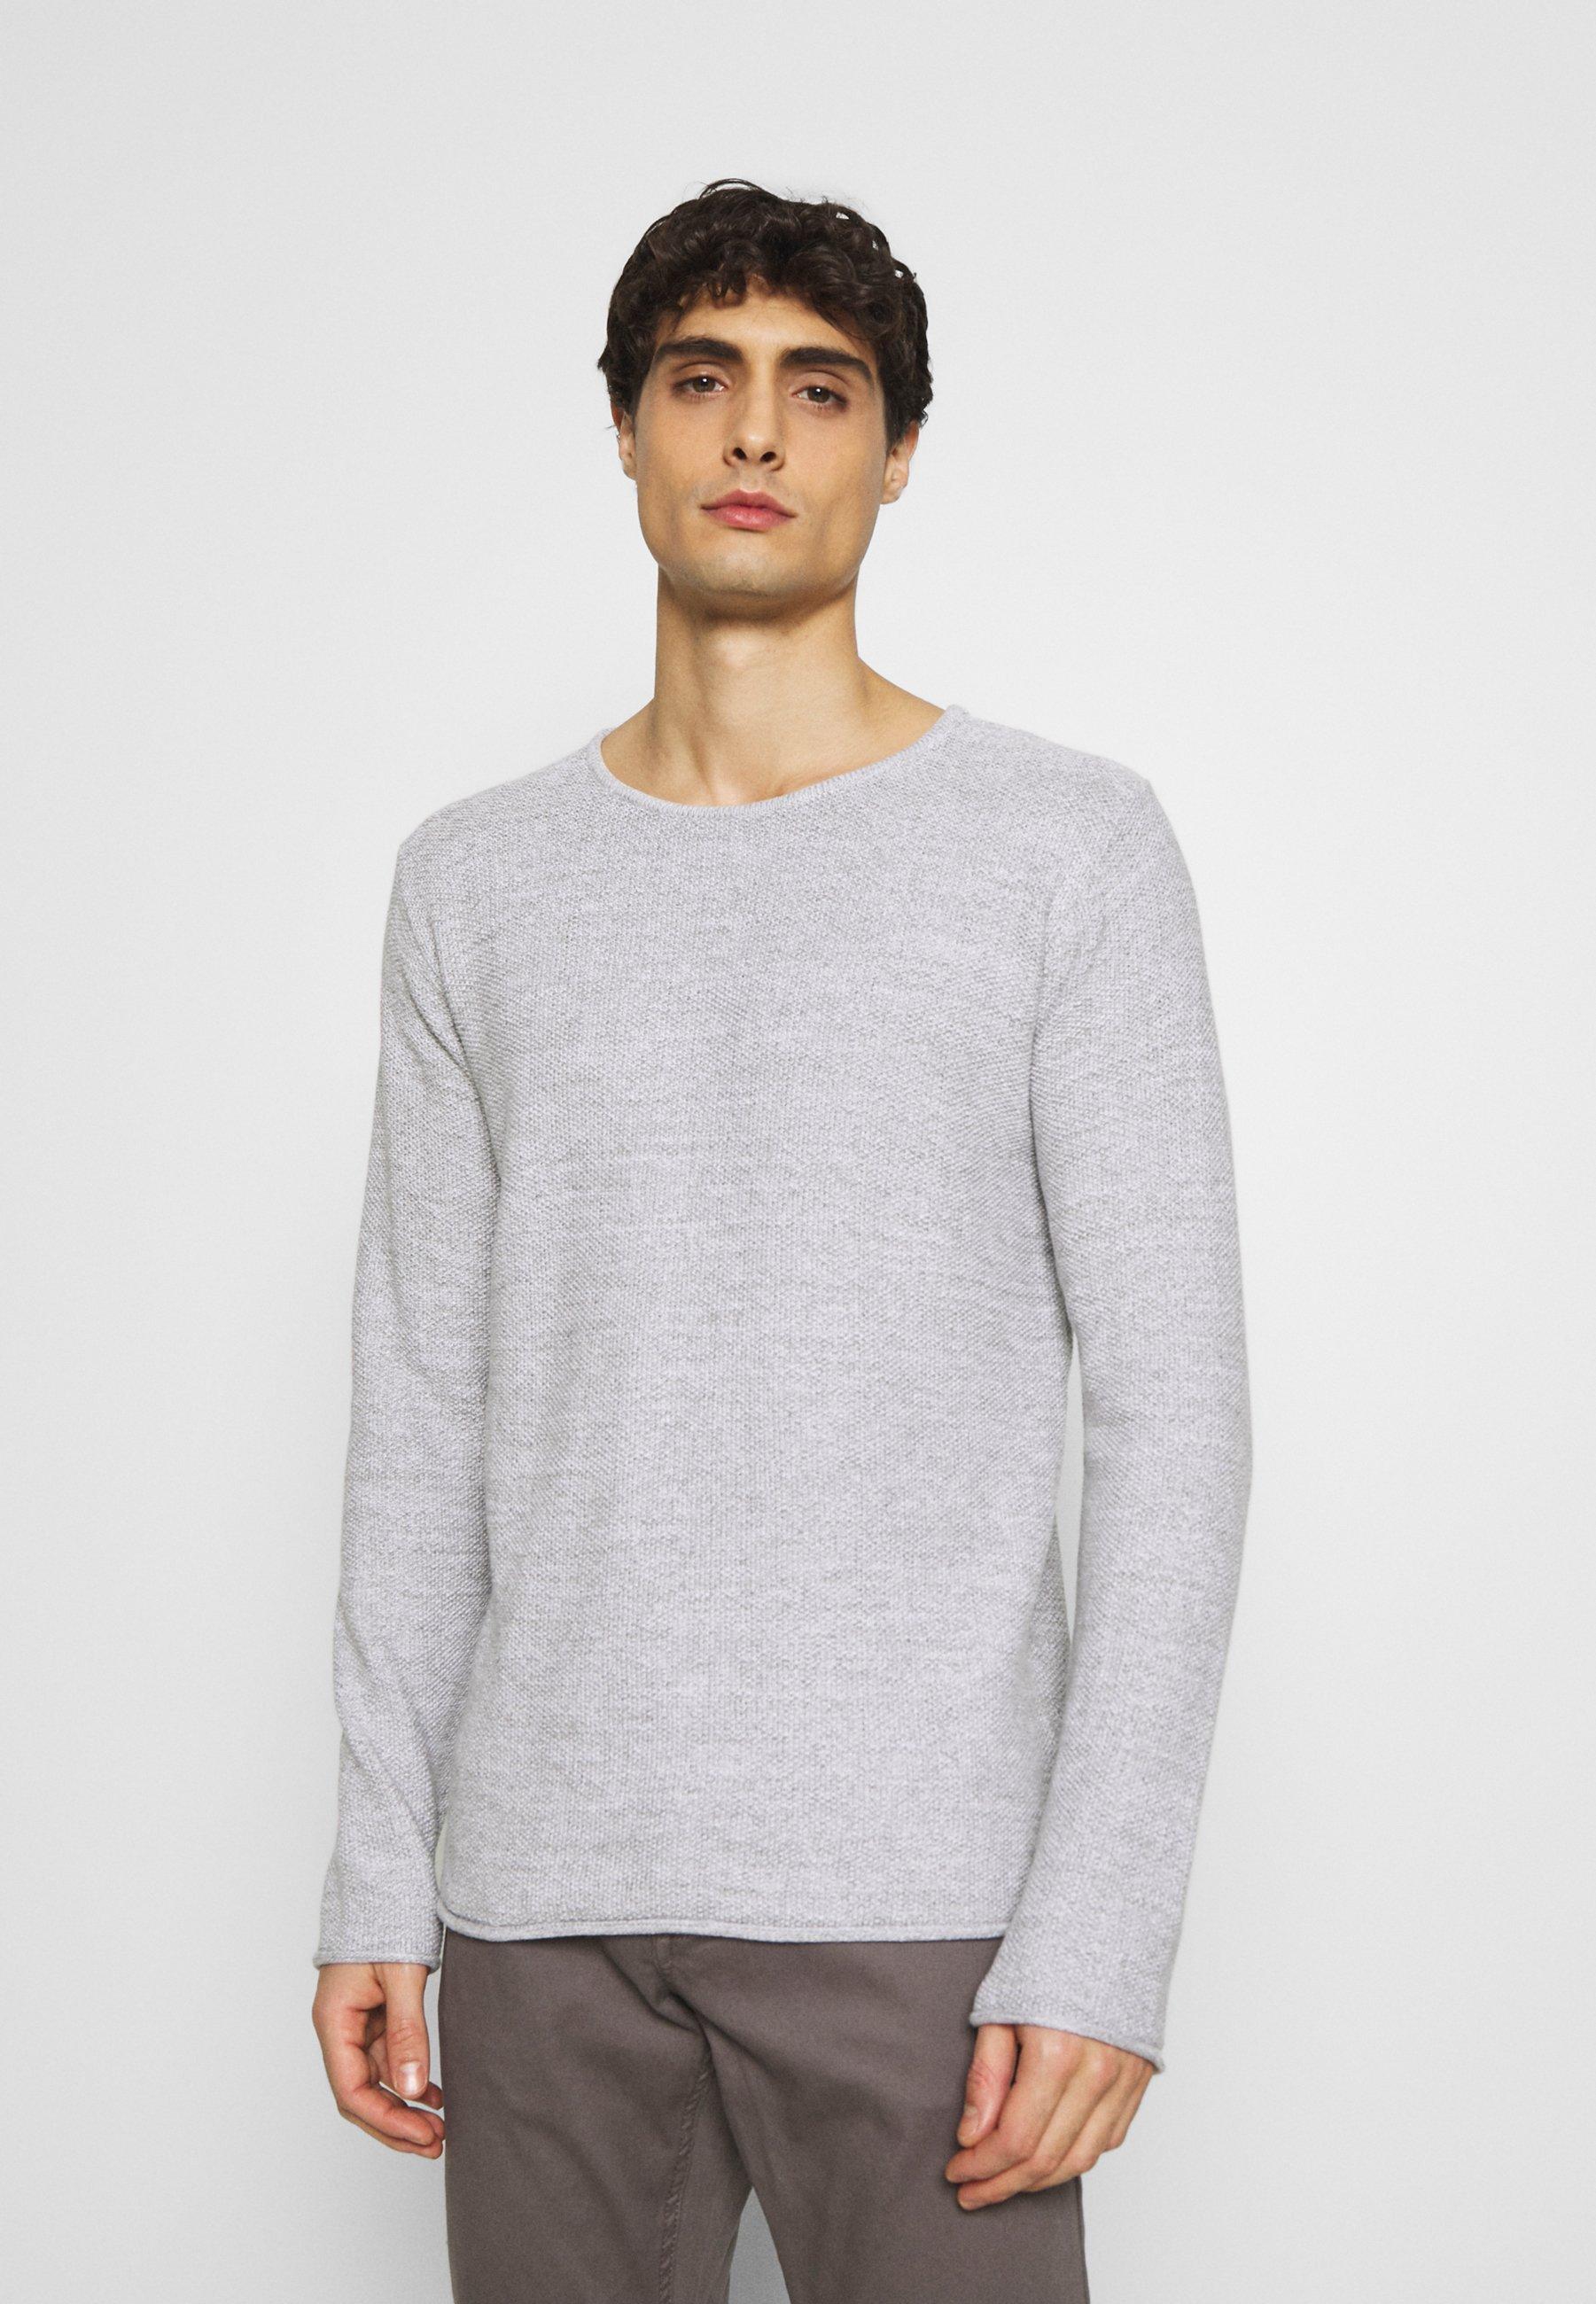 Homme KRISTAN - Pullover